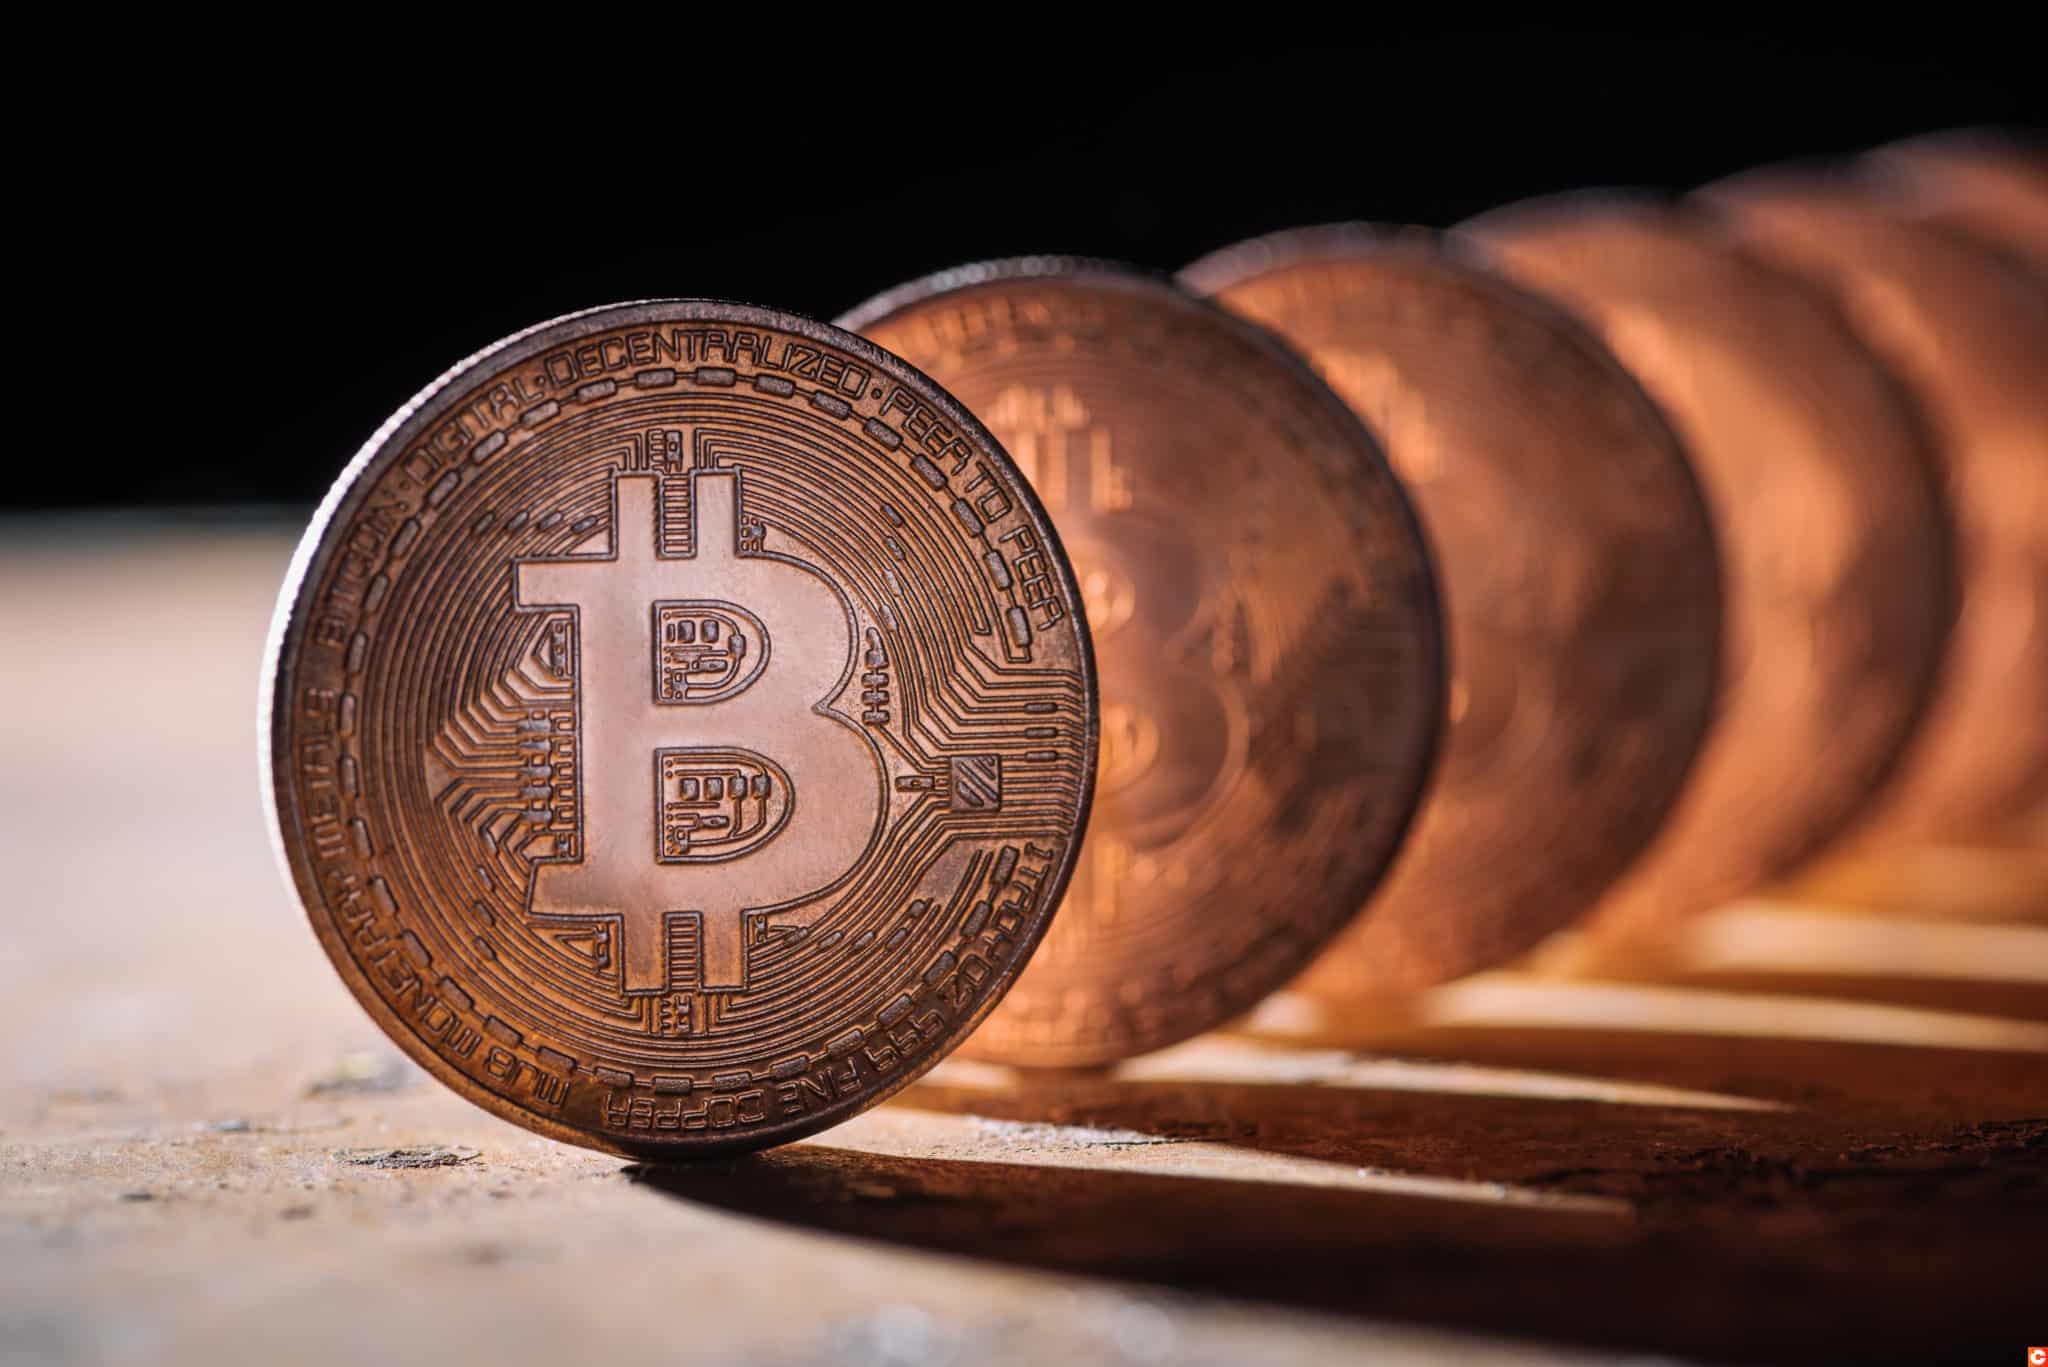 Bitcoin to Moldovan Leu, convert 1 BTC in MDL